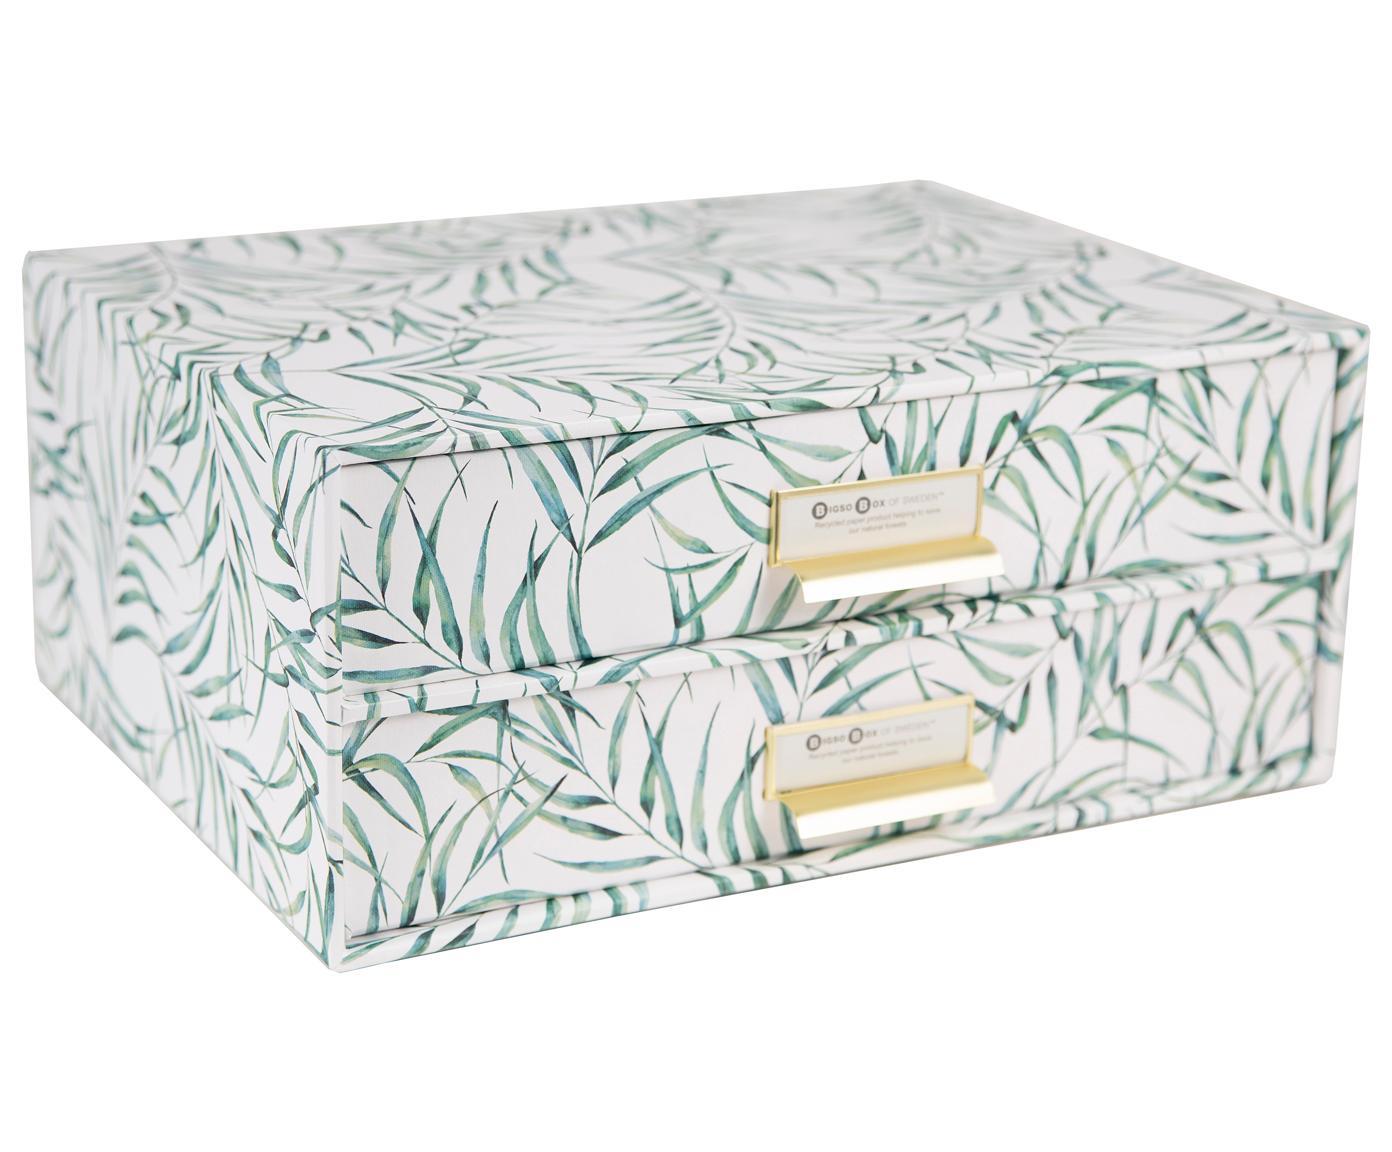 Bureau-organizer Breeze, Organizer: stevig, gelamineerd karto, Wit, groen, 33 x 15 cm